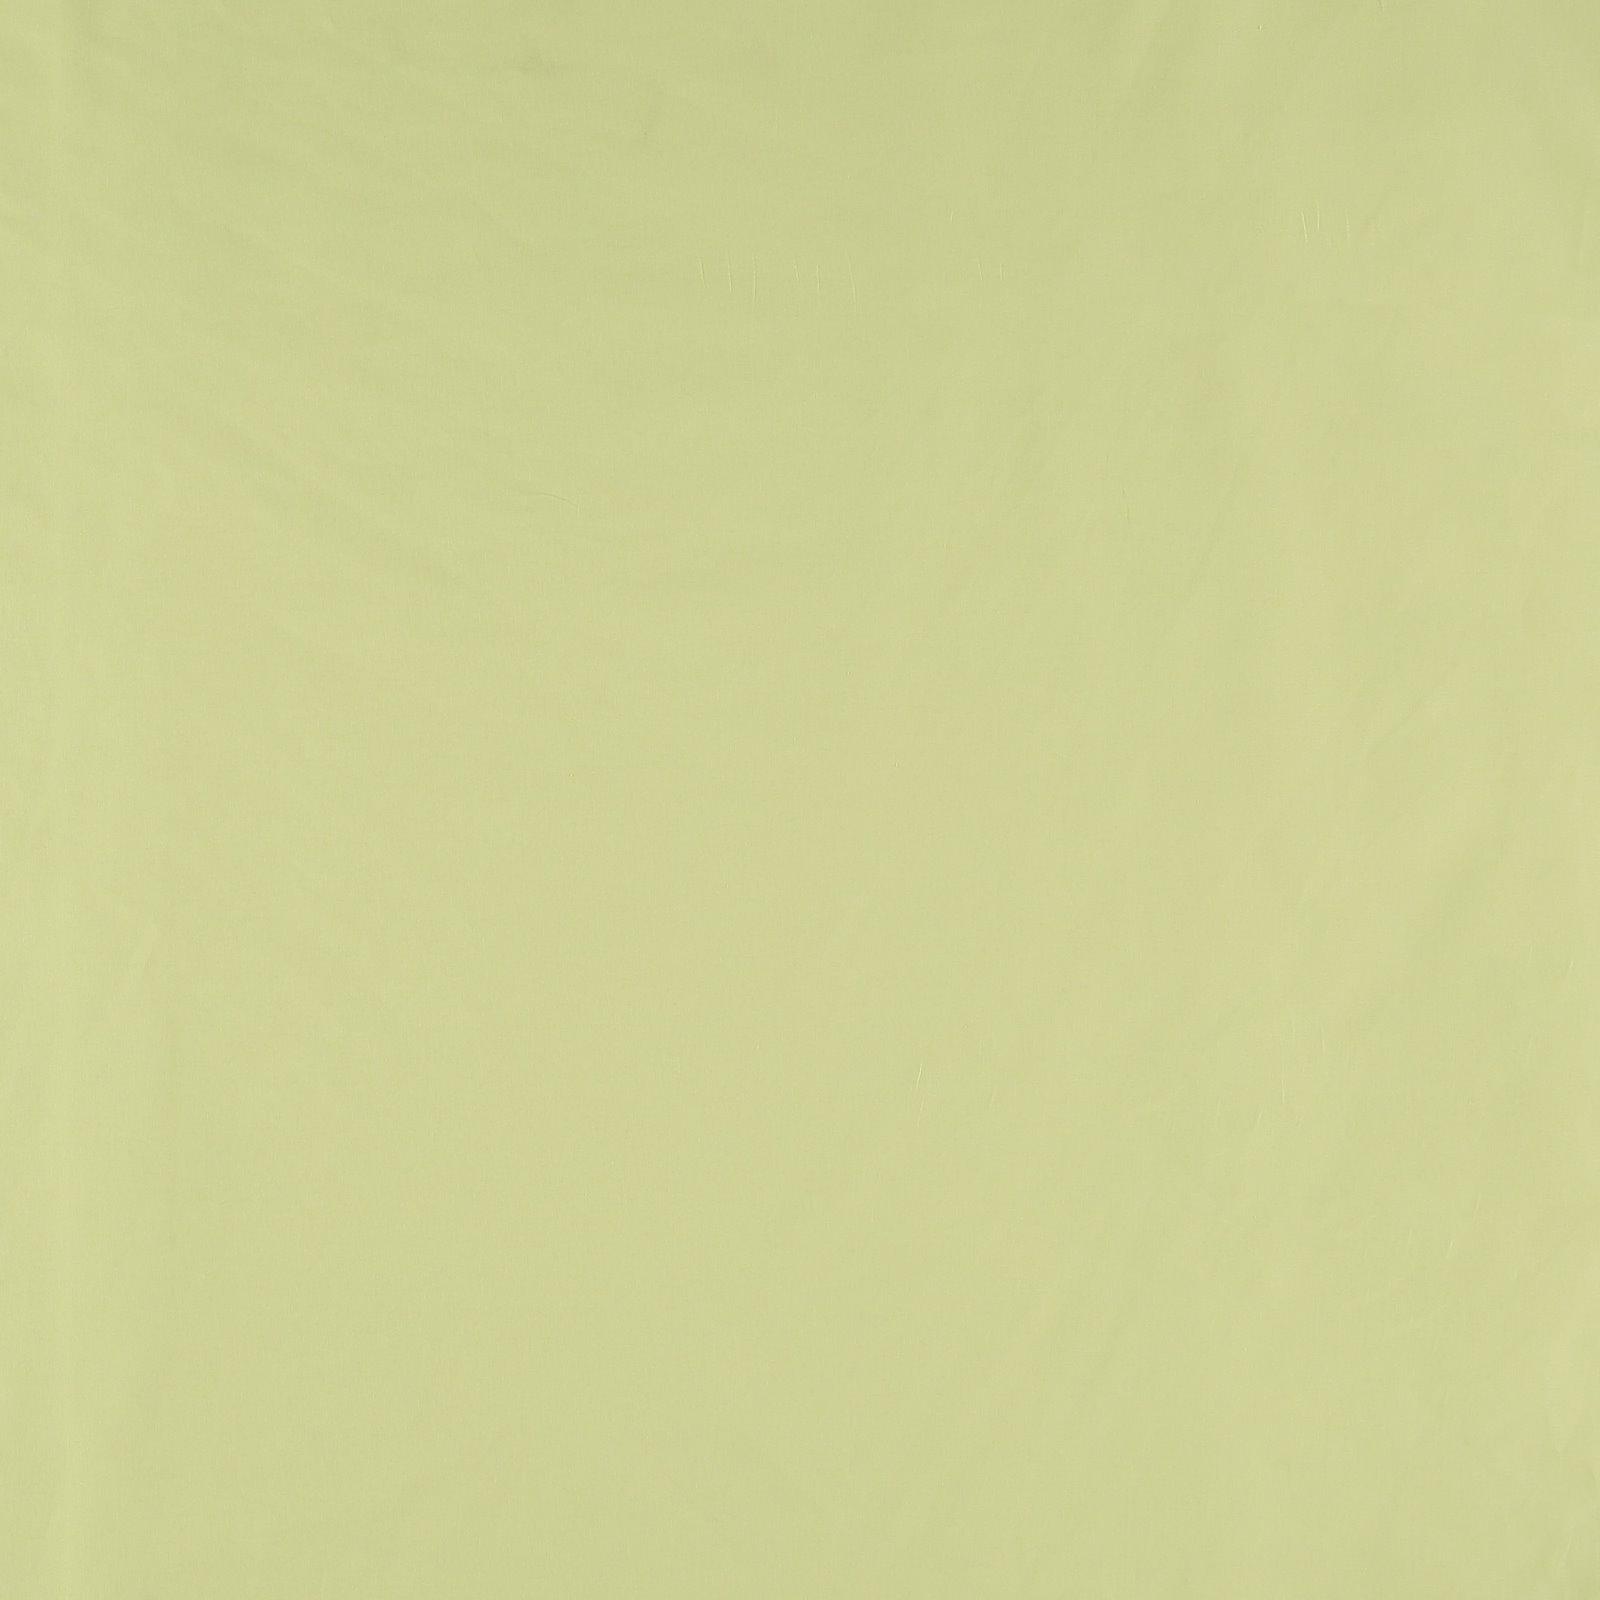 Luxury cotton light lemon 4357_pack_solid